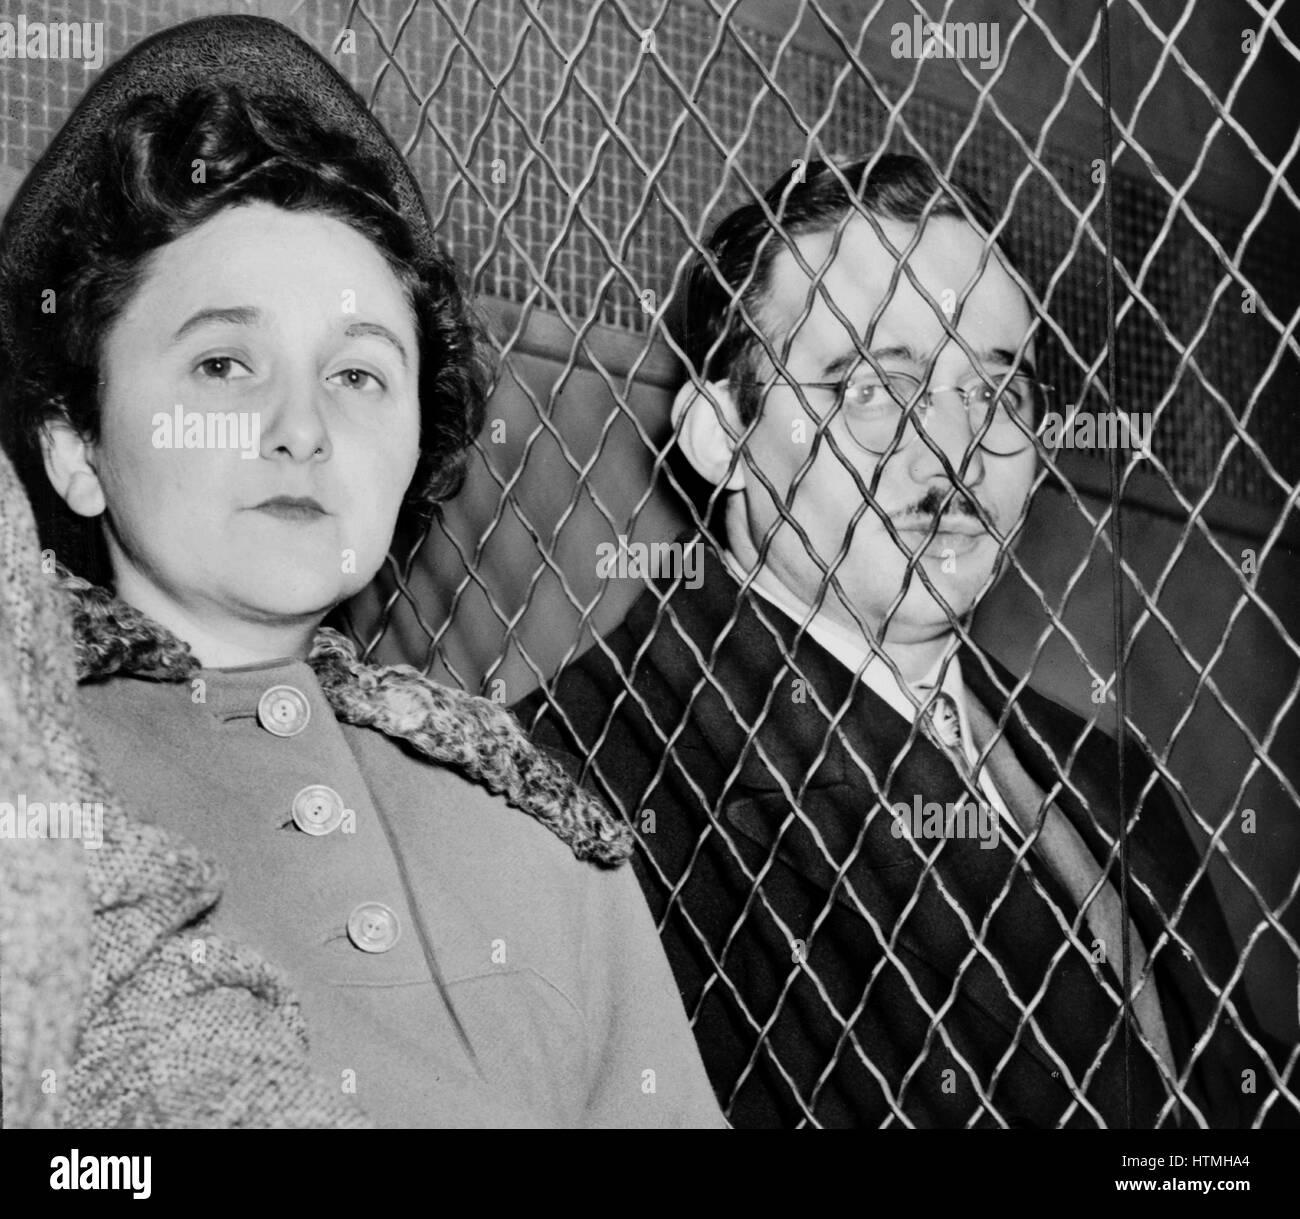 Julius Rosenberg (May 12, 1918 – June 19, 1953) and Ethel Rosenberg (September 28, 1915 – June 19, 1953) American - Stock Image